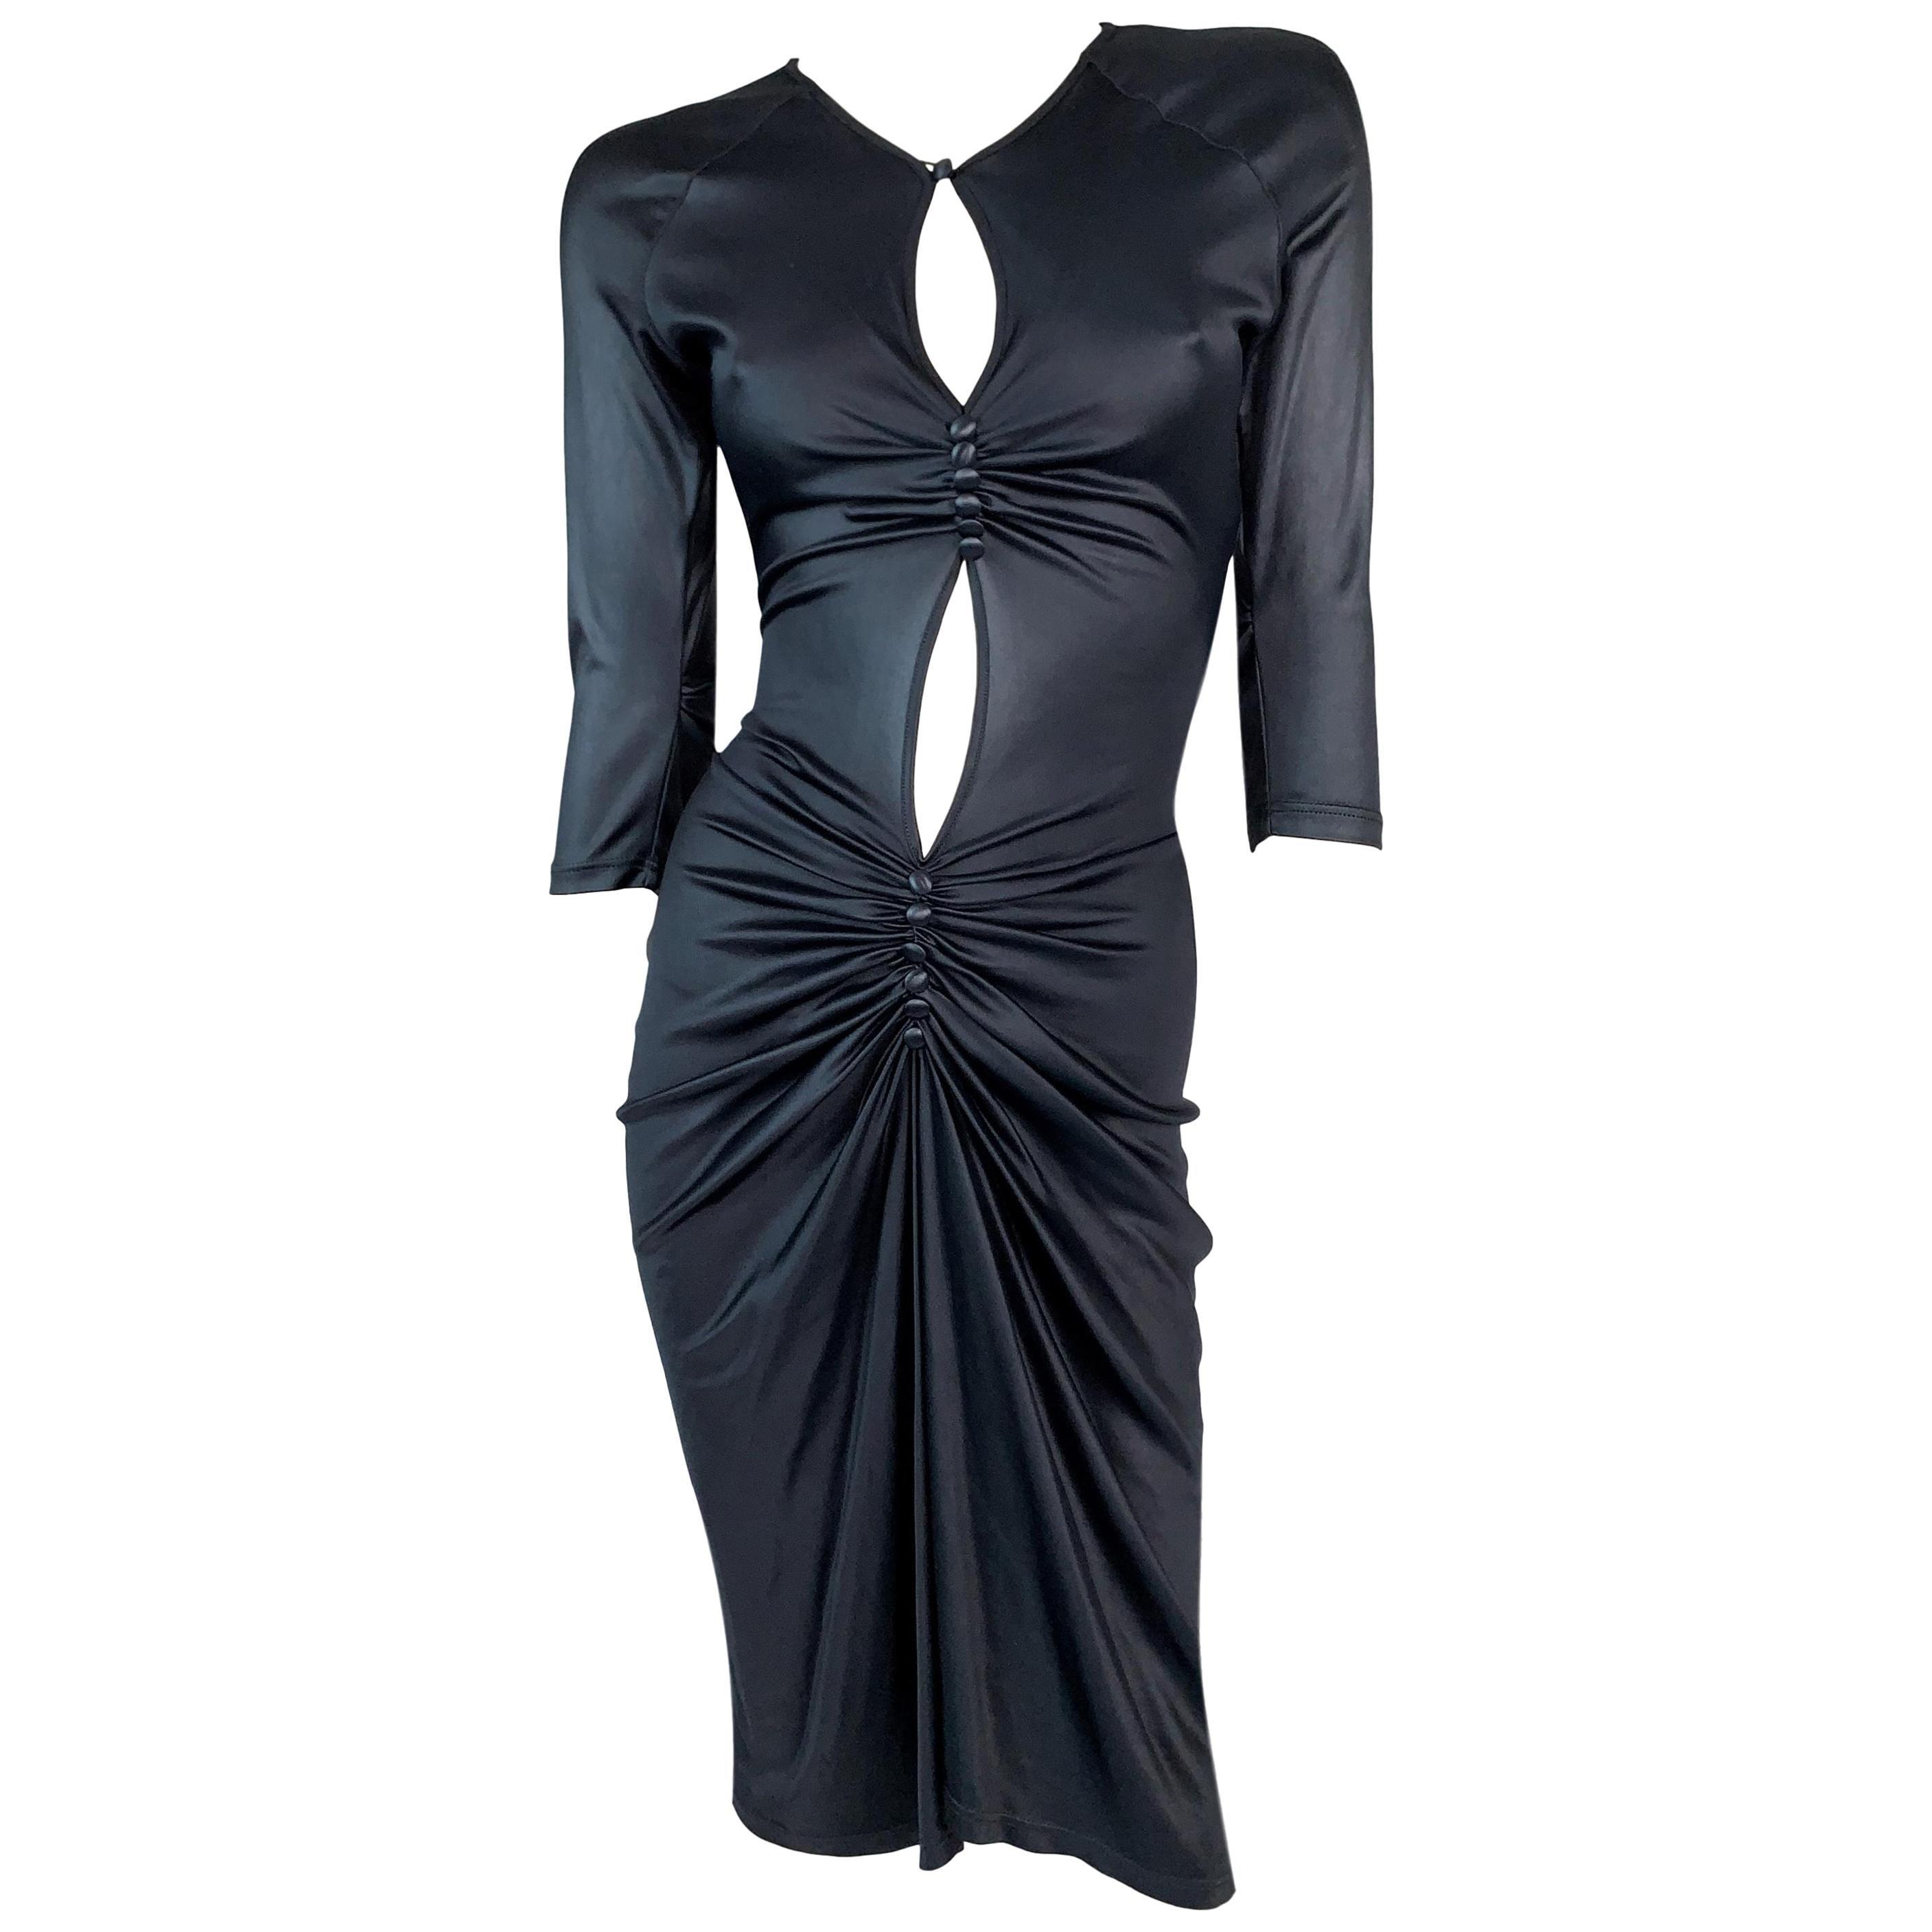 F/W 1998 Vivienne Westwood Runway Shiny Black Keyhole Cut-Out Bodycon Dress